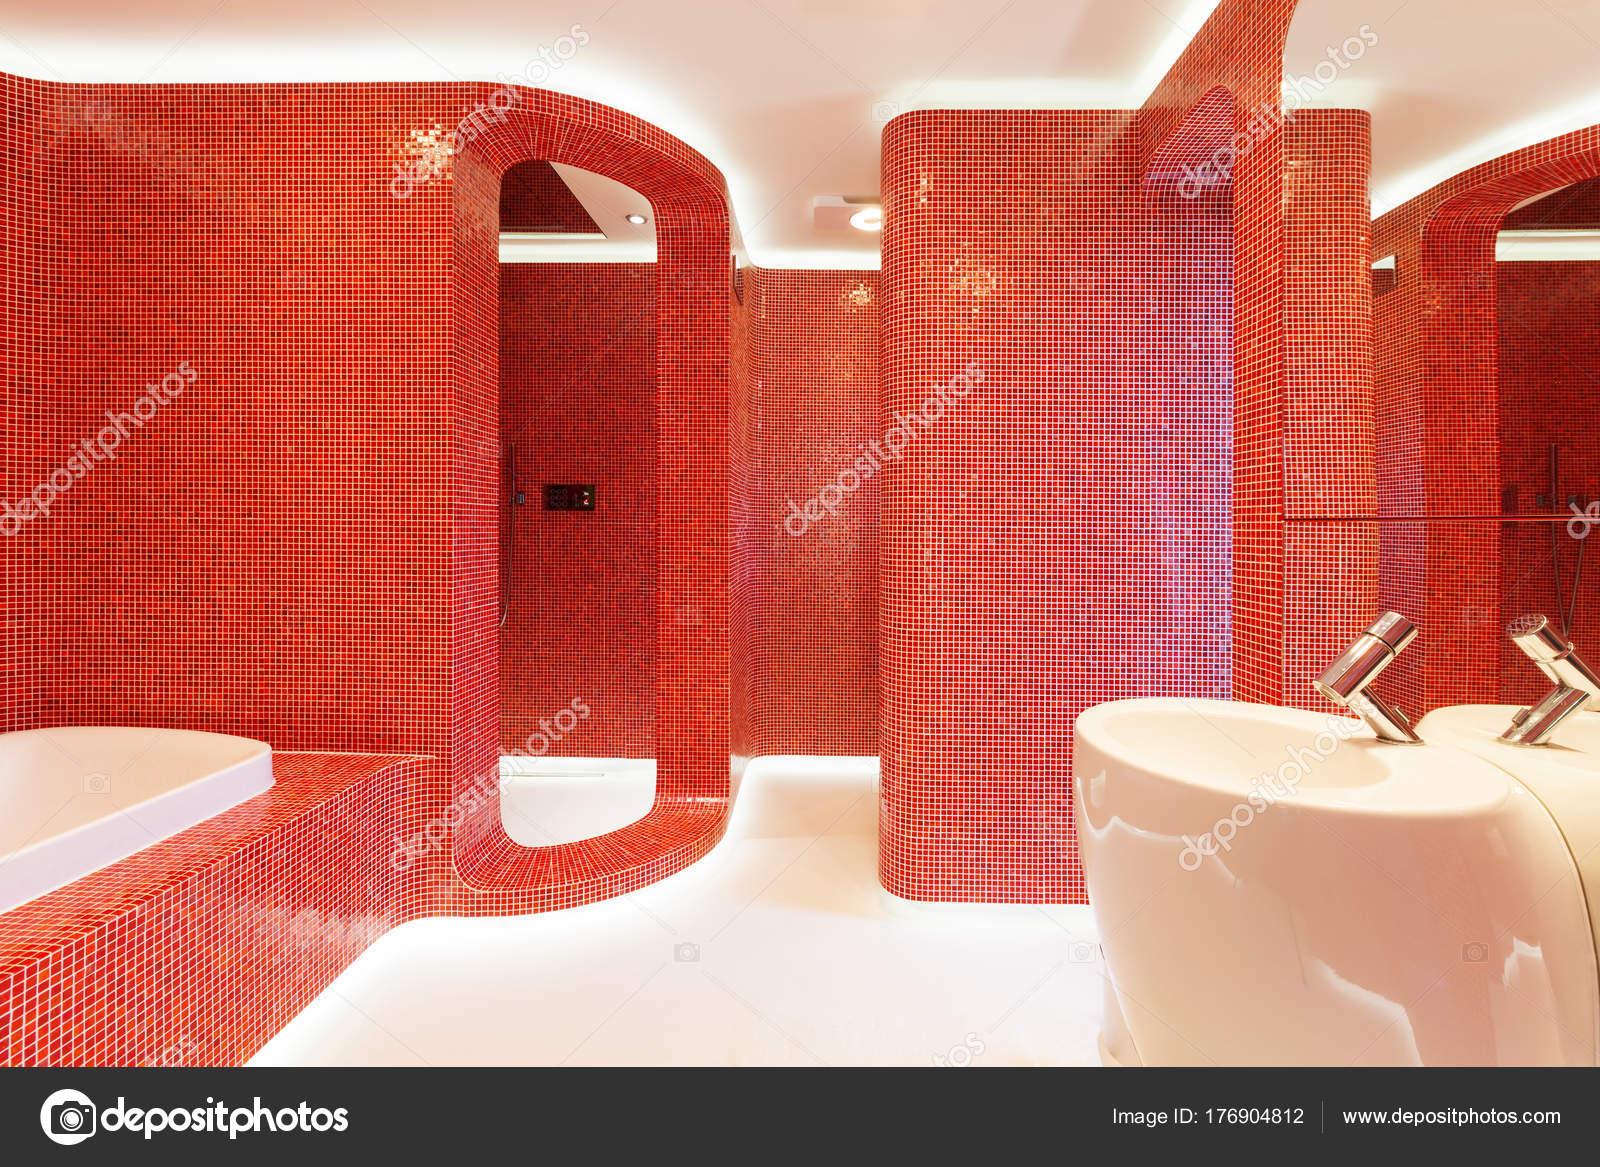 rot Badezimmer — Stockfoto © Zveiger #176904812